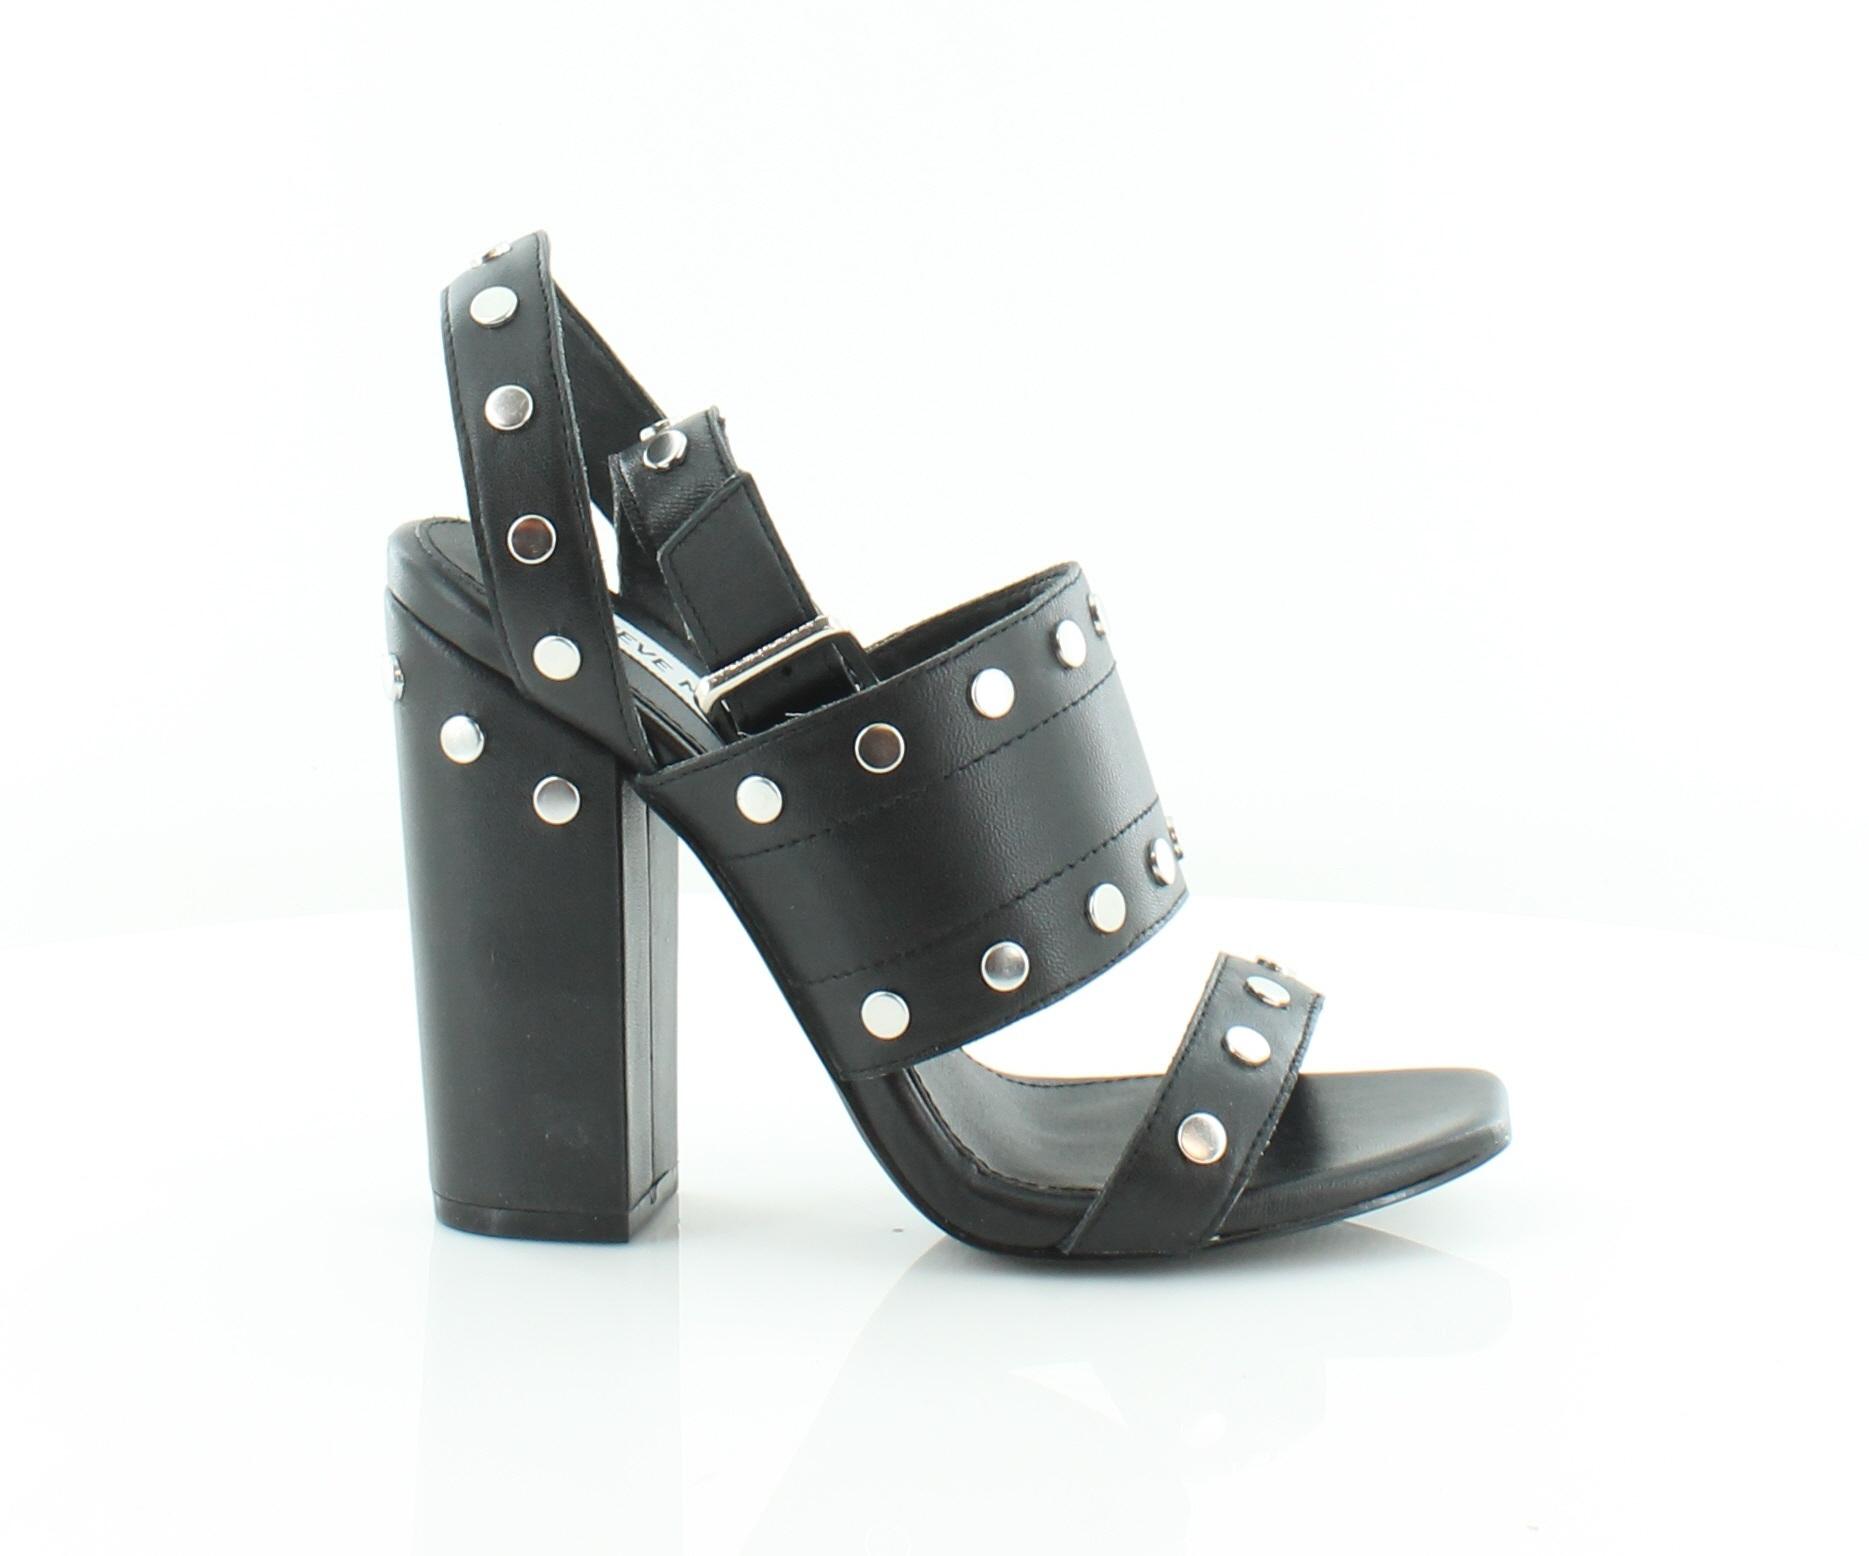 Steve Madden Jansen Women's Heels Black Size 6 M